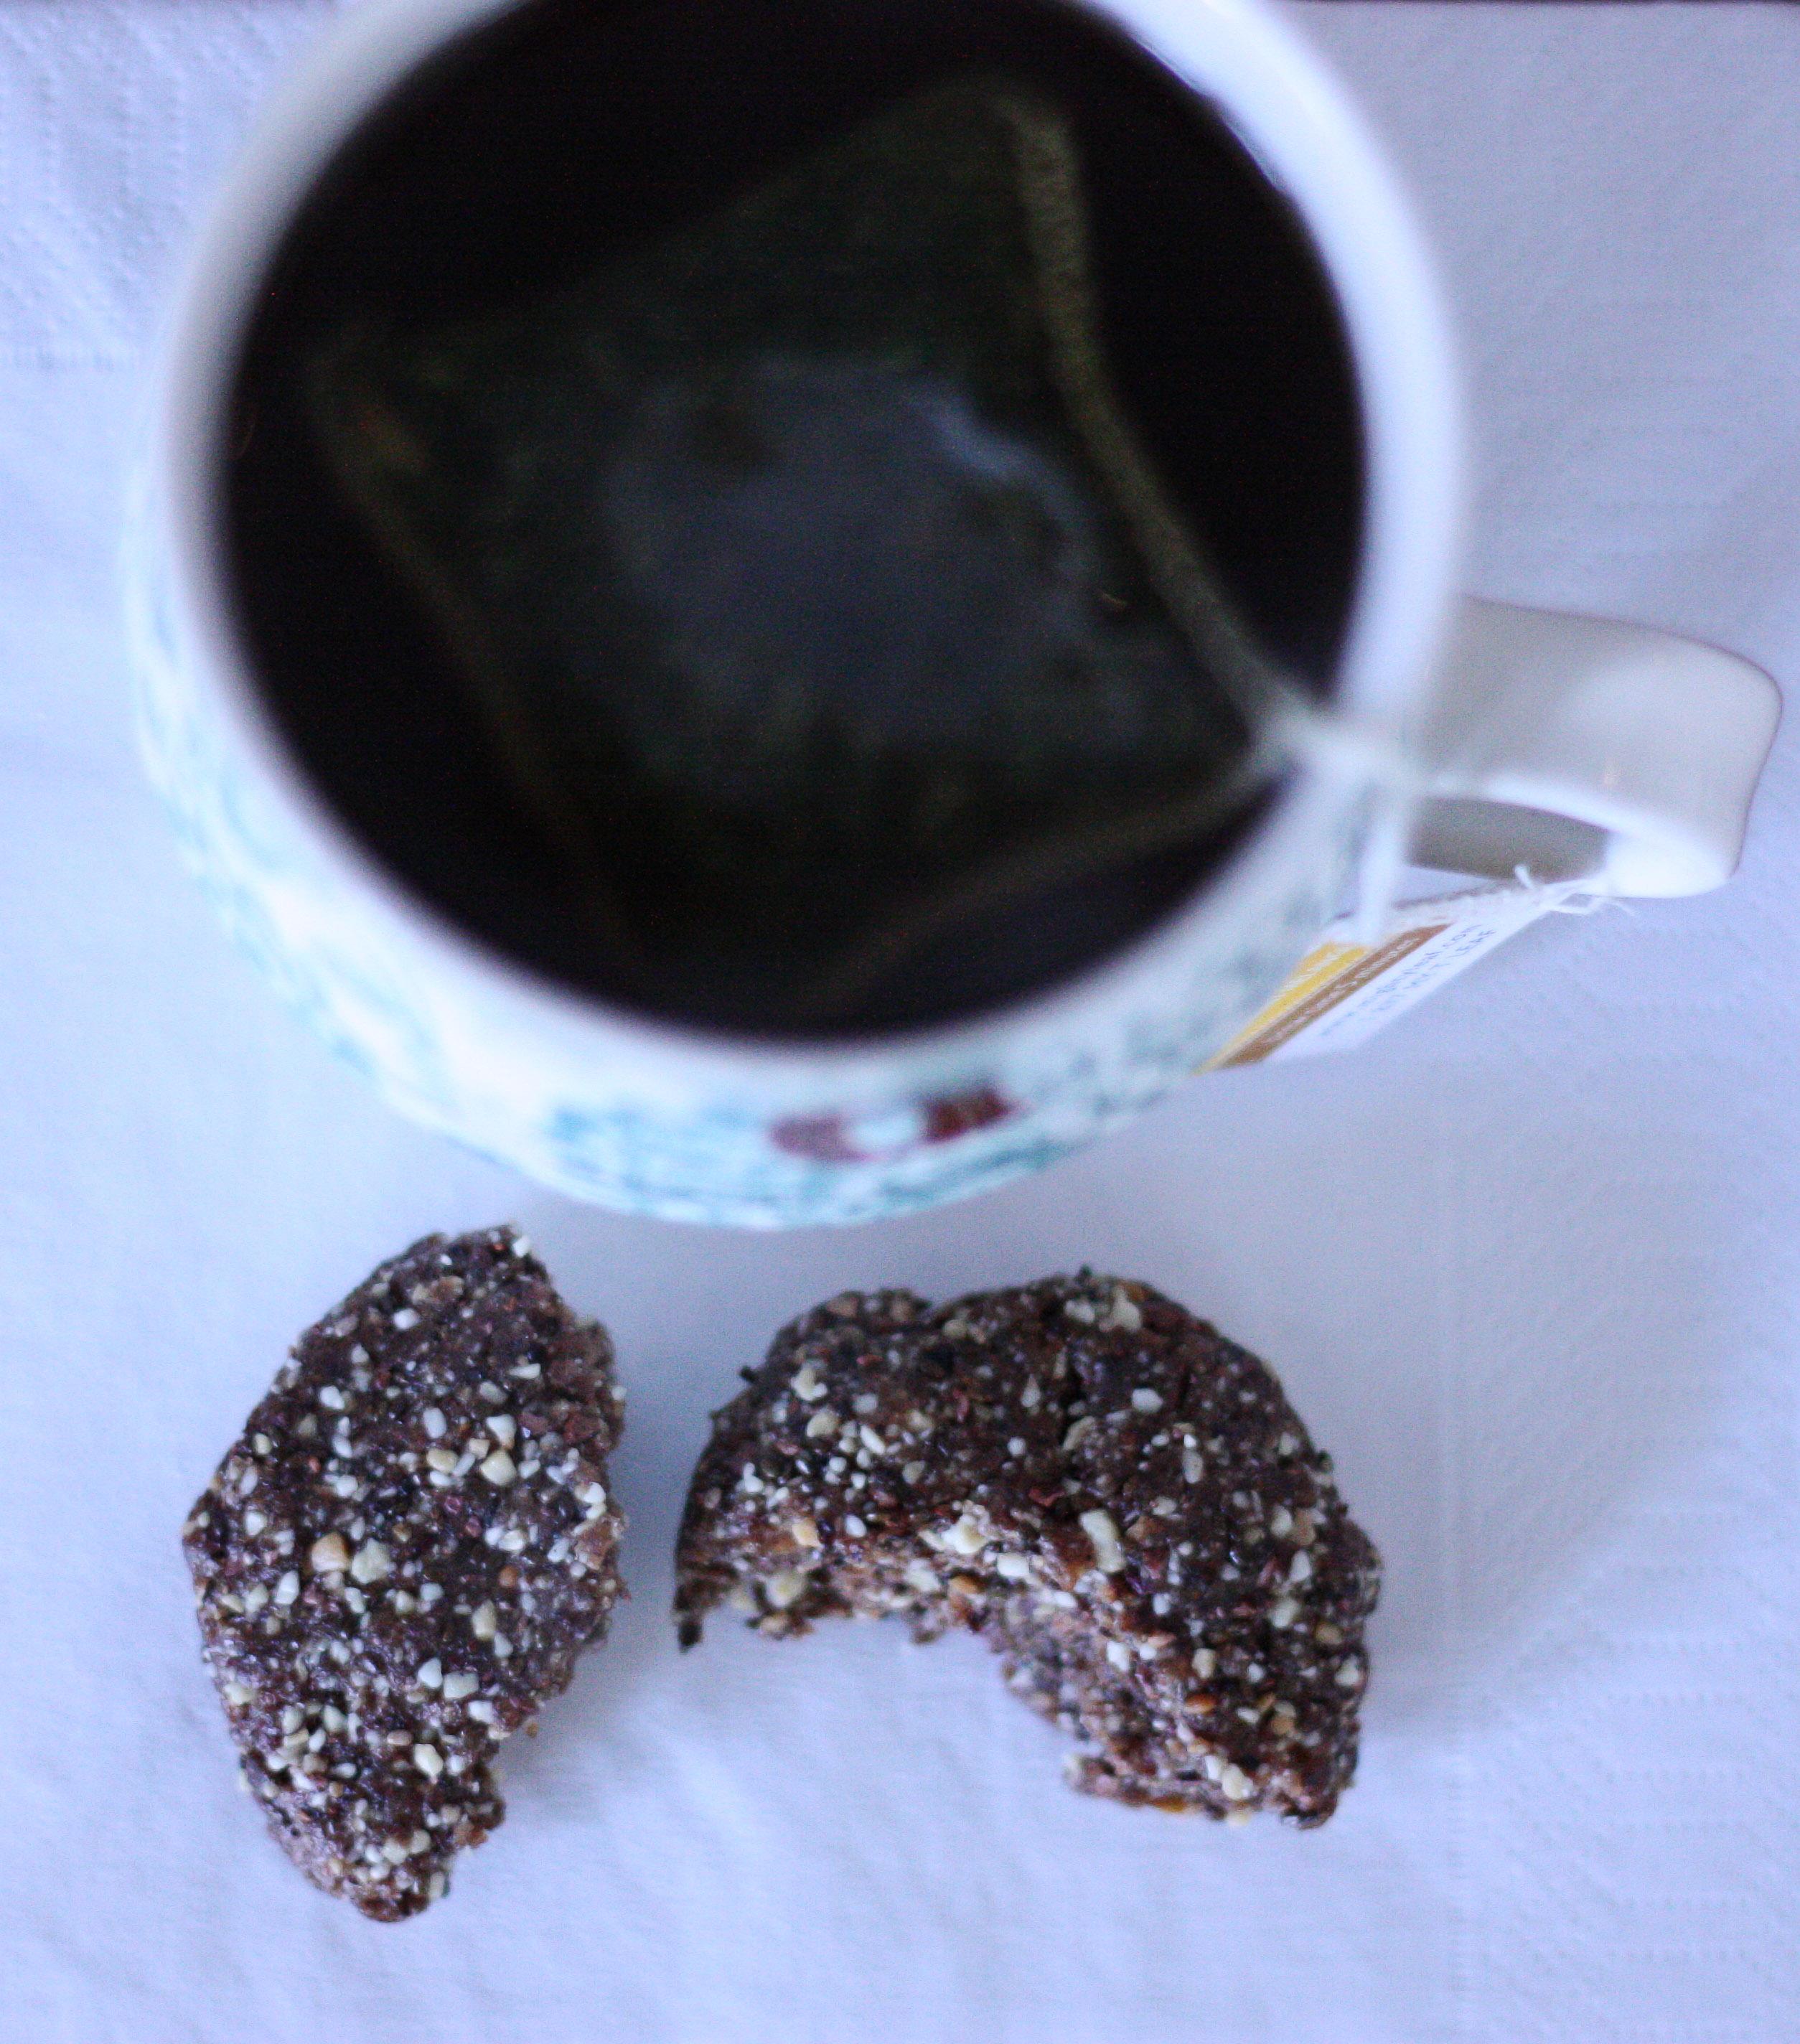 Homemade Chocolate Chip Cookie Dough Larabars Recipes — Dishmaps